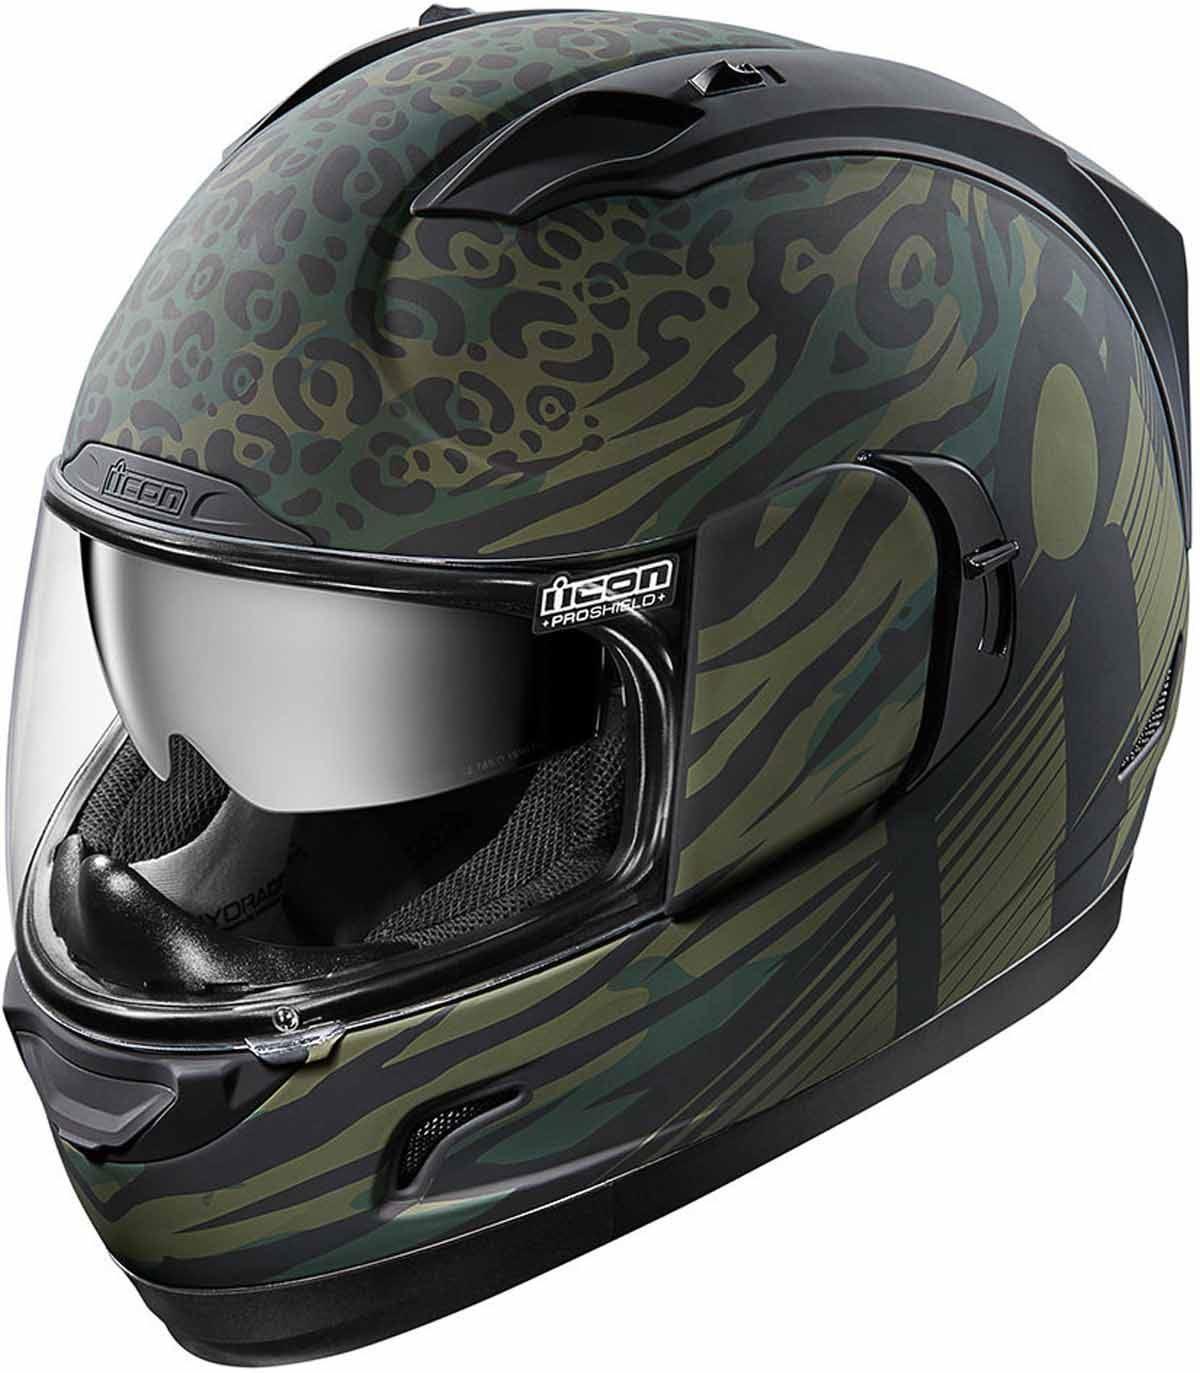 ICON-Alliance-GT-Helmet-Full-Face-Removable-Interior-Inner-Sunshield-XS-3XL